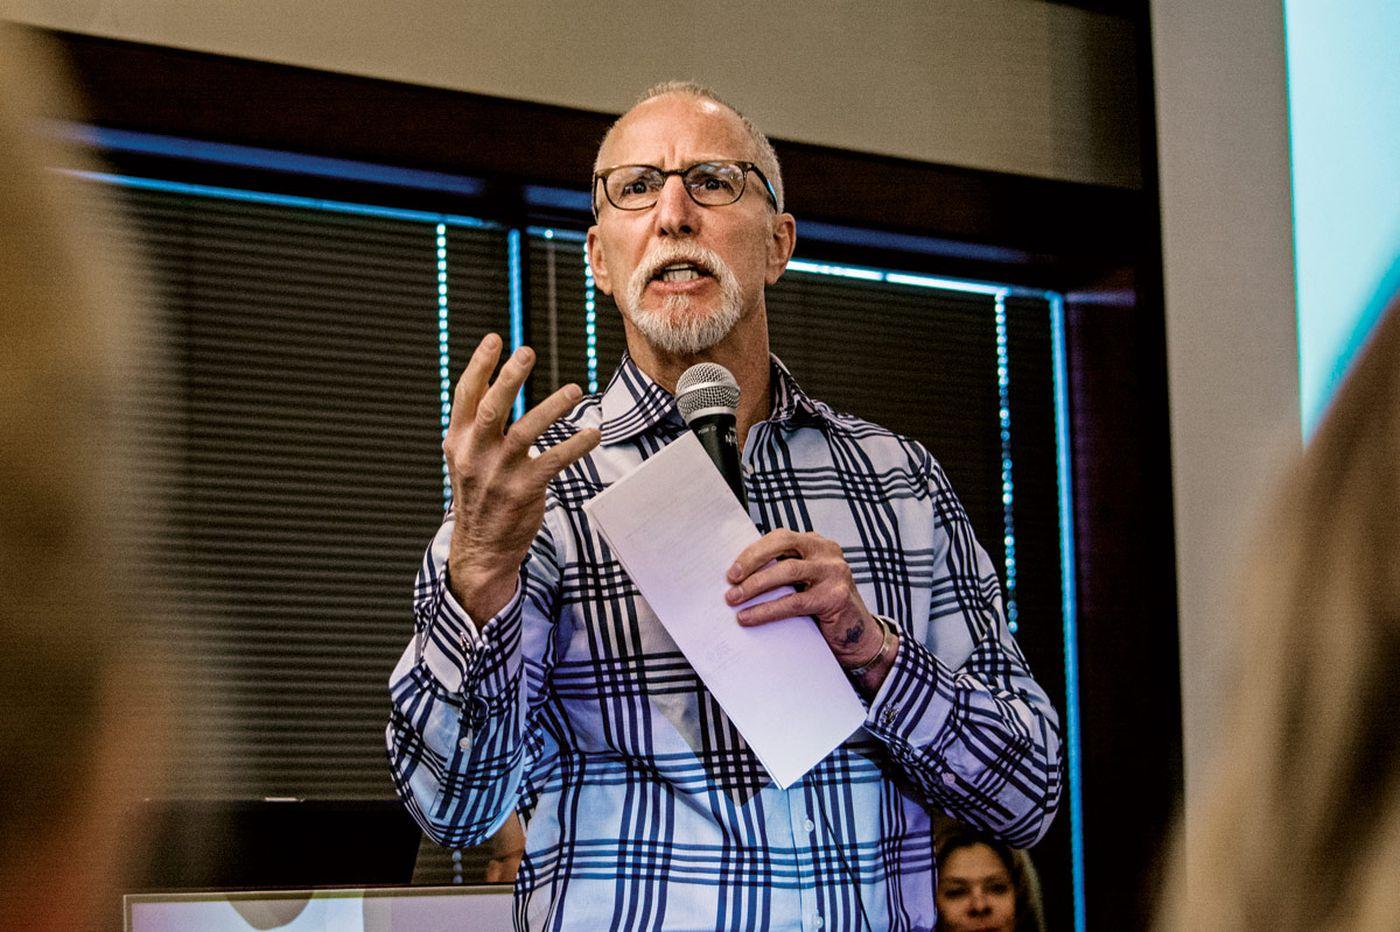 'Woo woo': Pat Croce gives WCU $250K for mindfulness studies